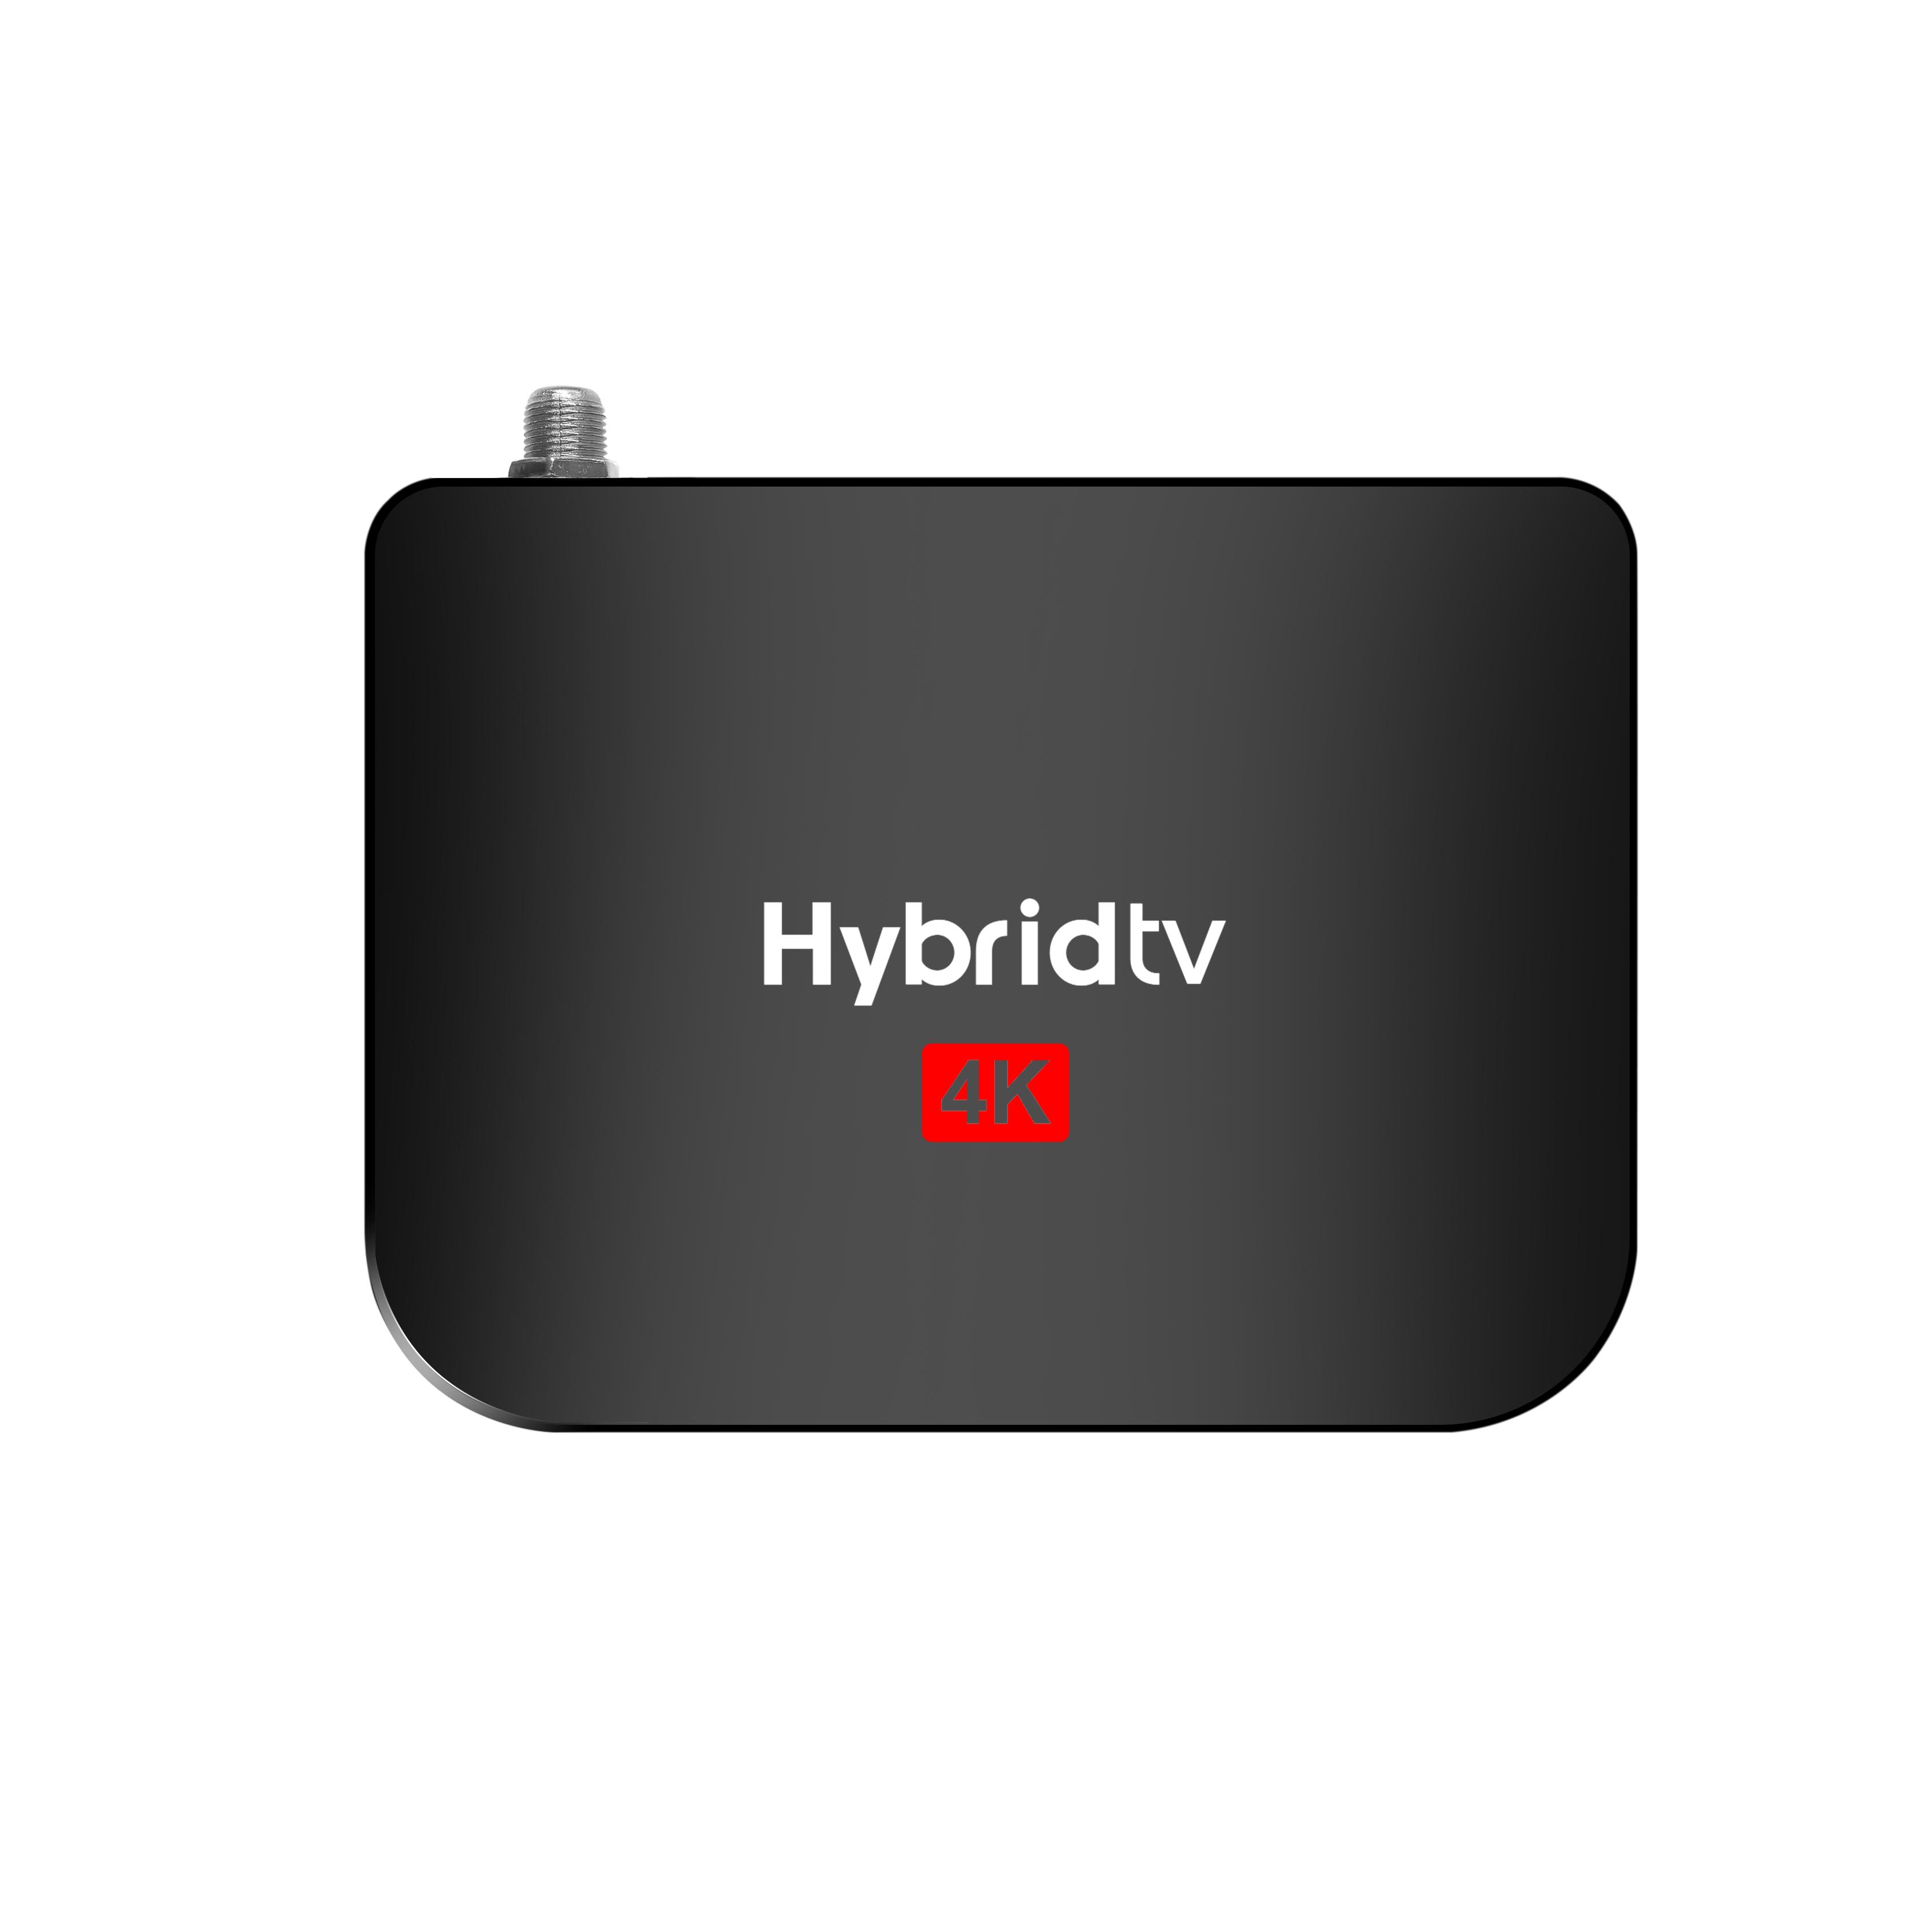 M8S PLUS S2(2+16GB) TV Box with Remote Control 2.4 WIFI for Android 9.0 black_EU Plug